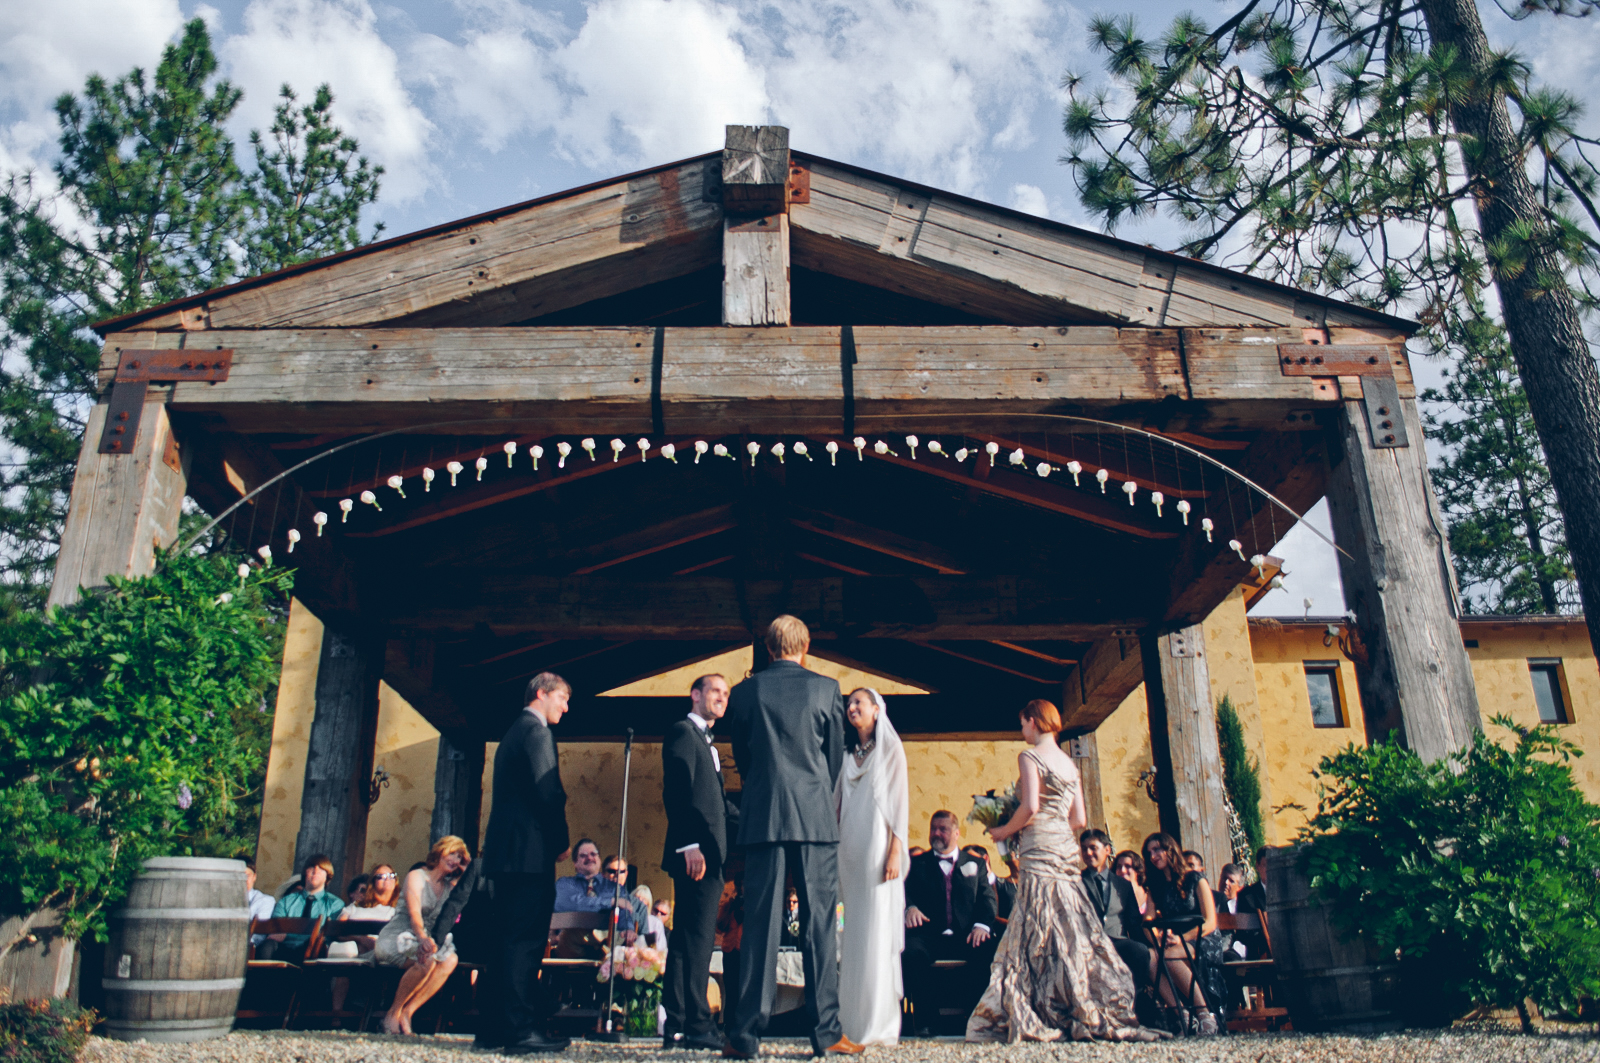 miraflores_winery_wedding_photography_ian_melissa_ebony_siovhan_bokeh_photography_28.jpg